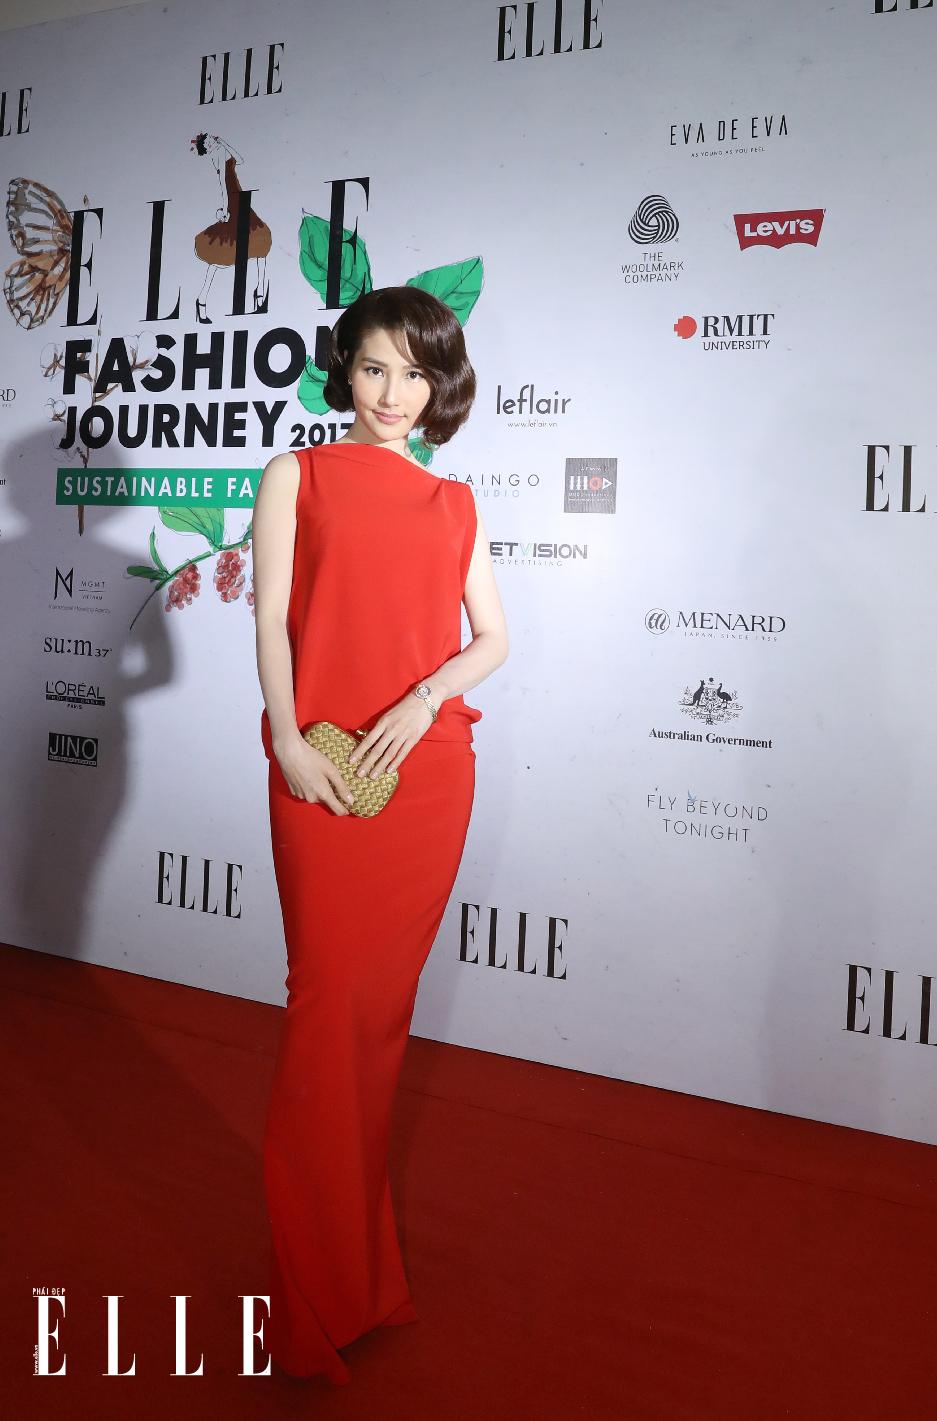 elle fashion journey 2017 32